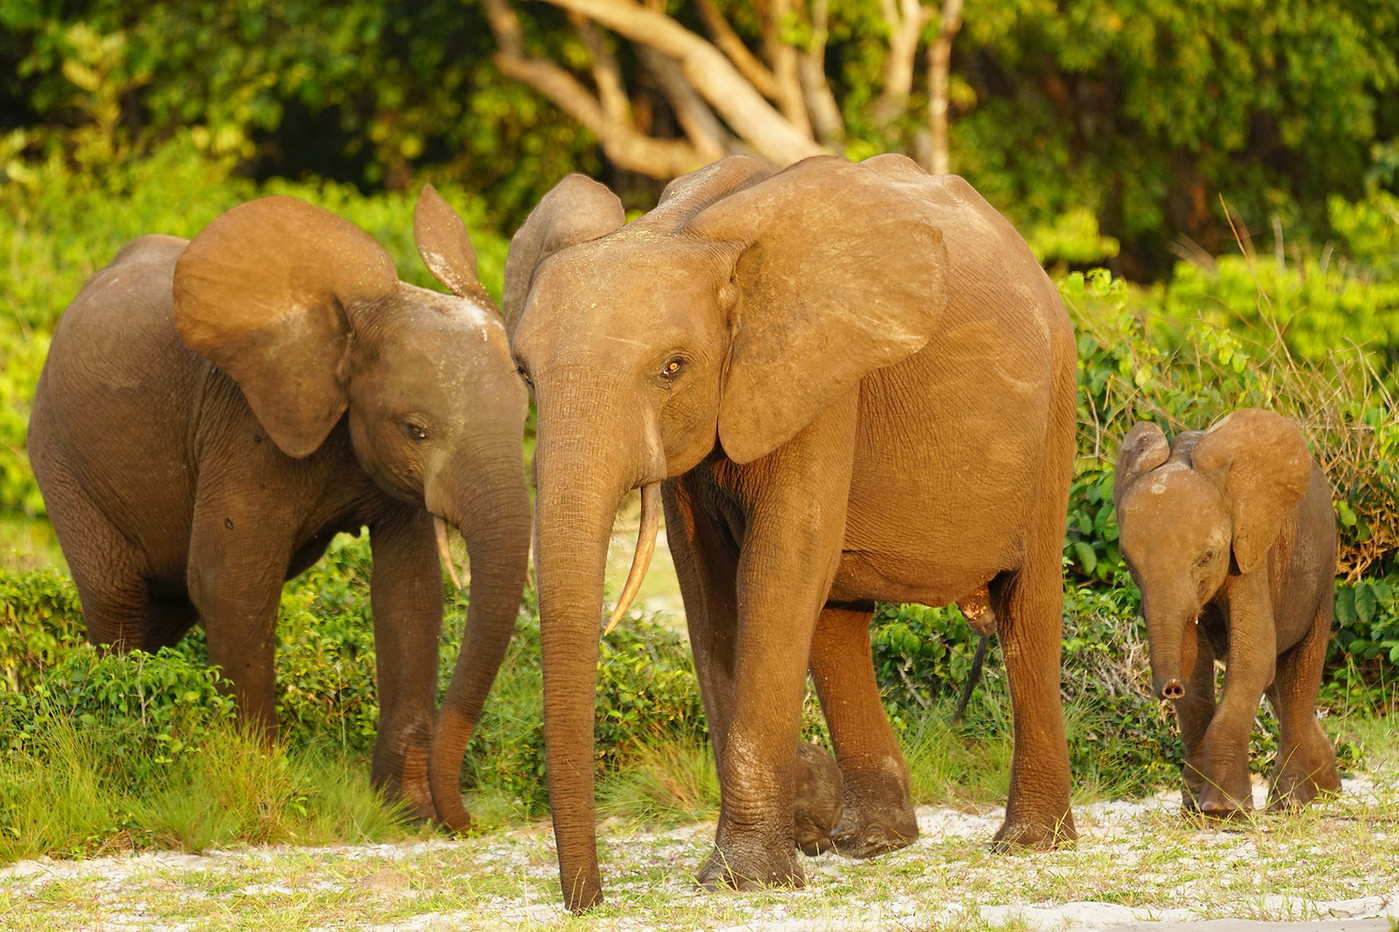 Forest elephants & calf in Luango NP, Gabon